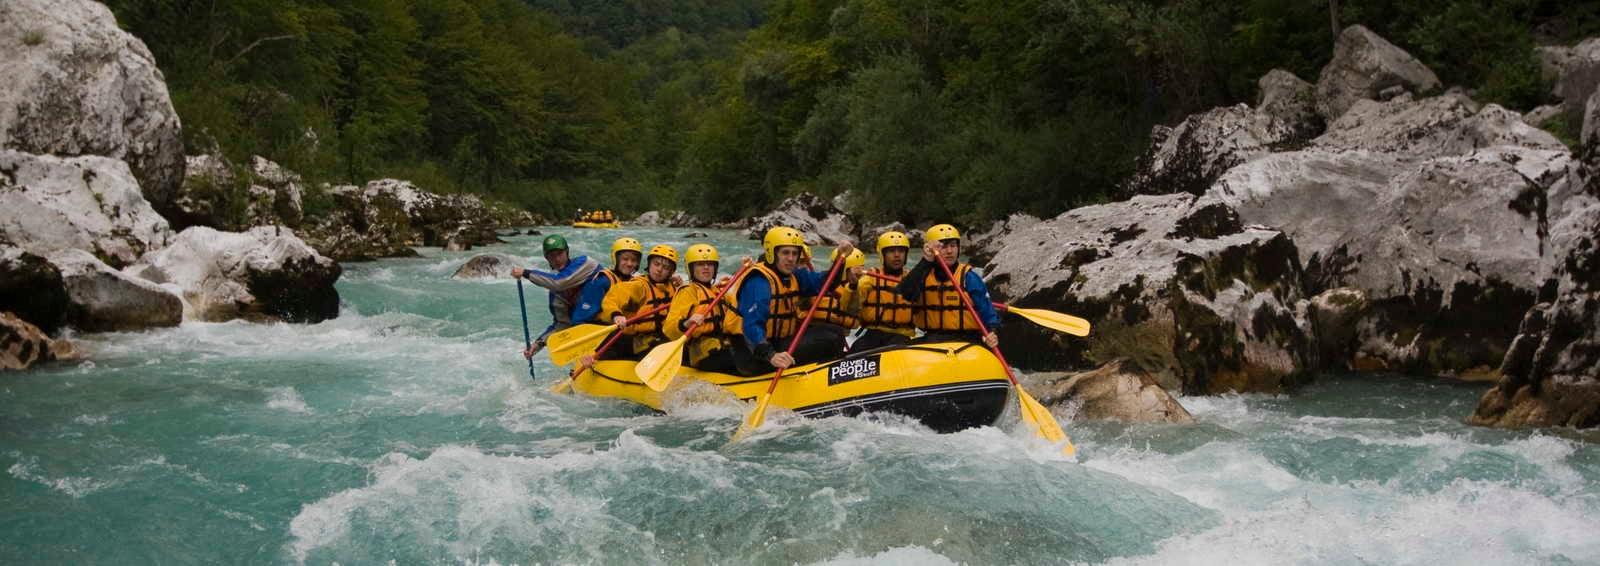 white water rafting group